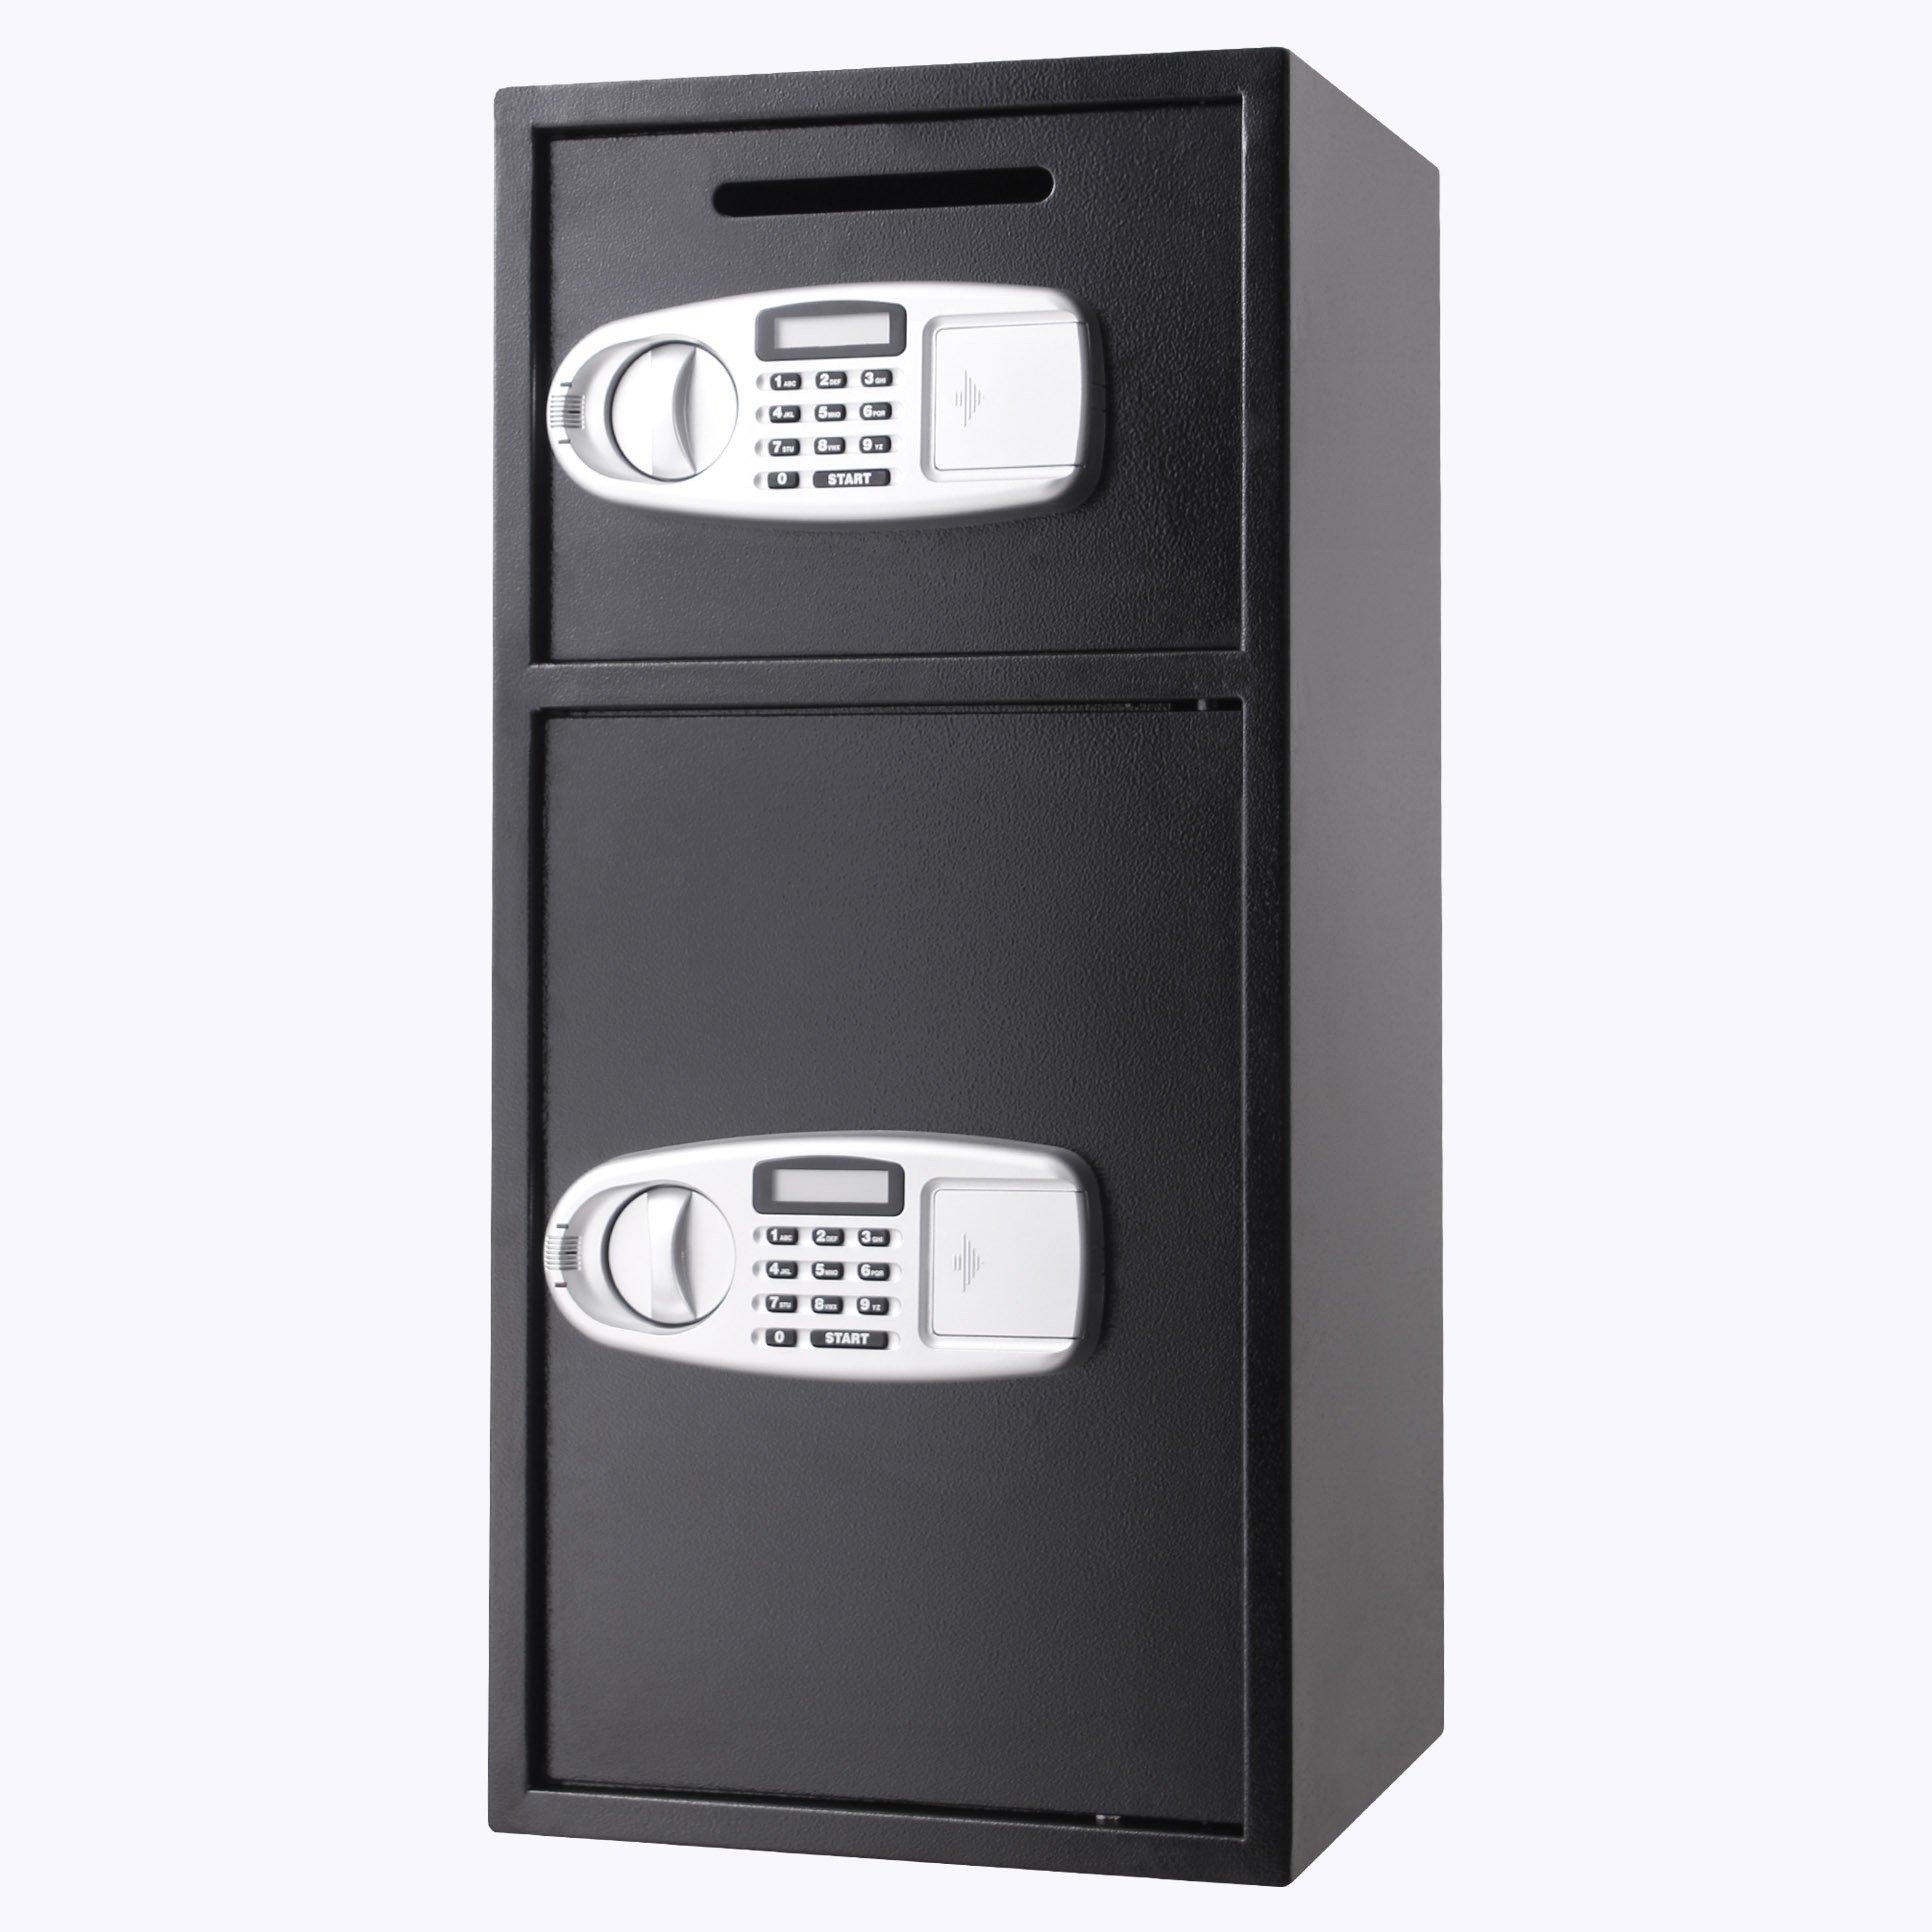 VEVOR Security Safe Box Double Door Digital Safe Depository for Money Gun Jewelry by VEVOR